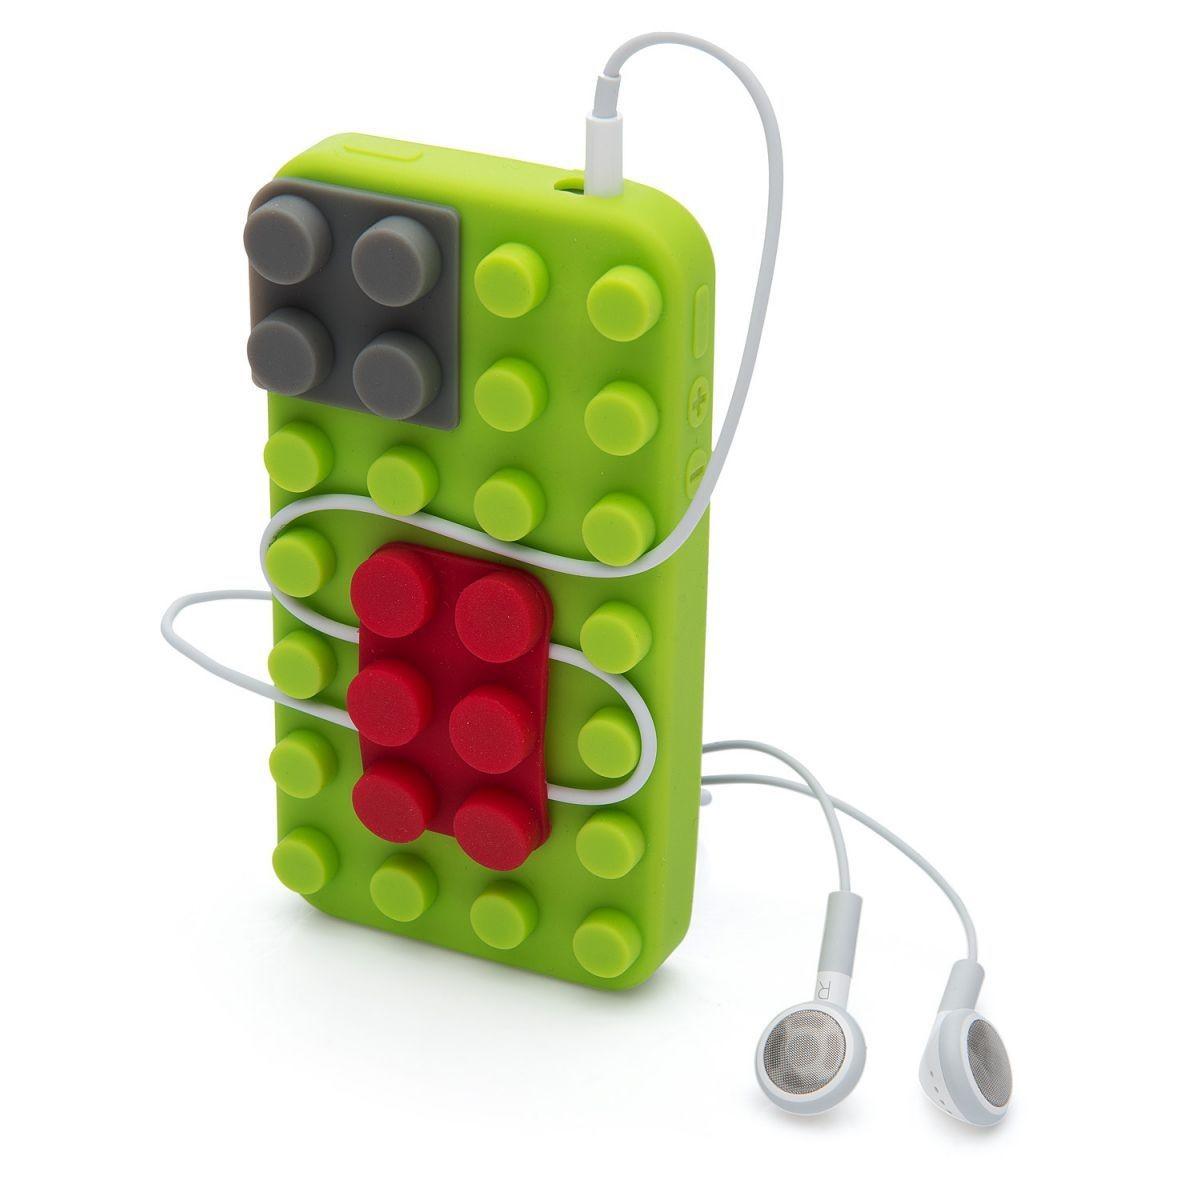 Http://loja.imaginarium.com.br/case-celular-bloco-verde-4g.html